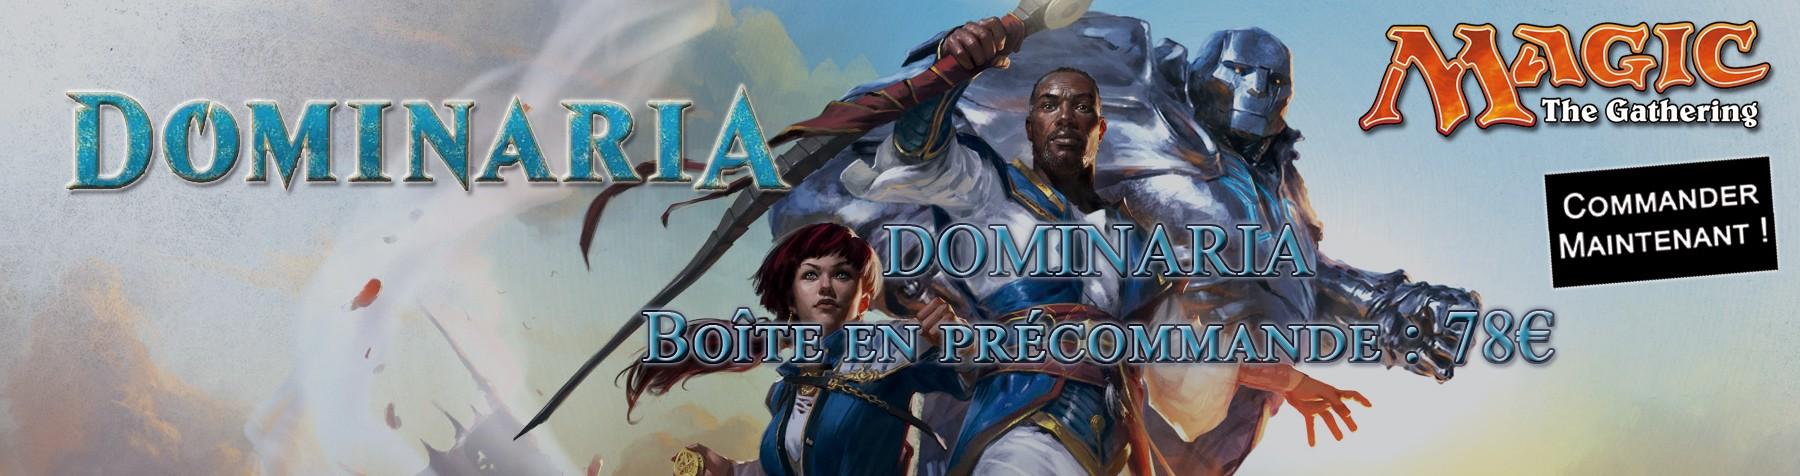 Nouvelle collection Dominaria